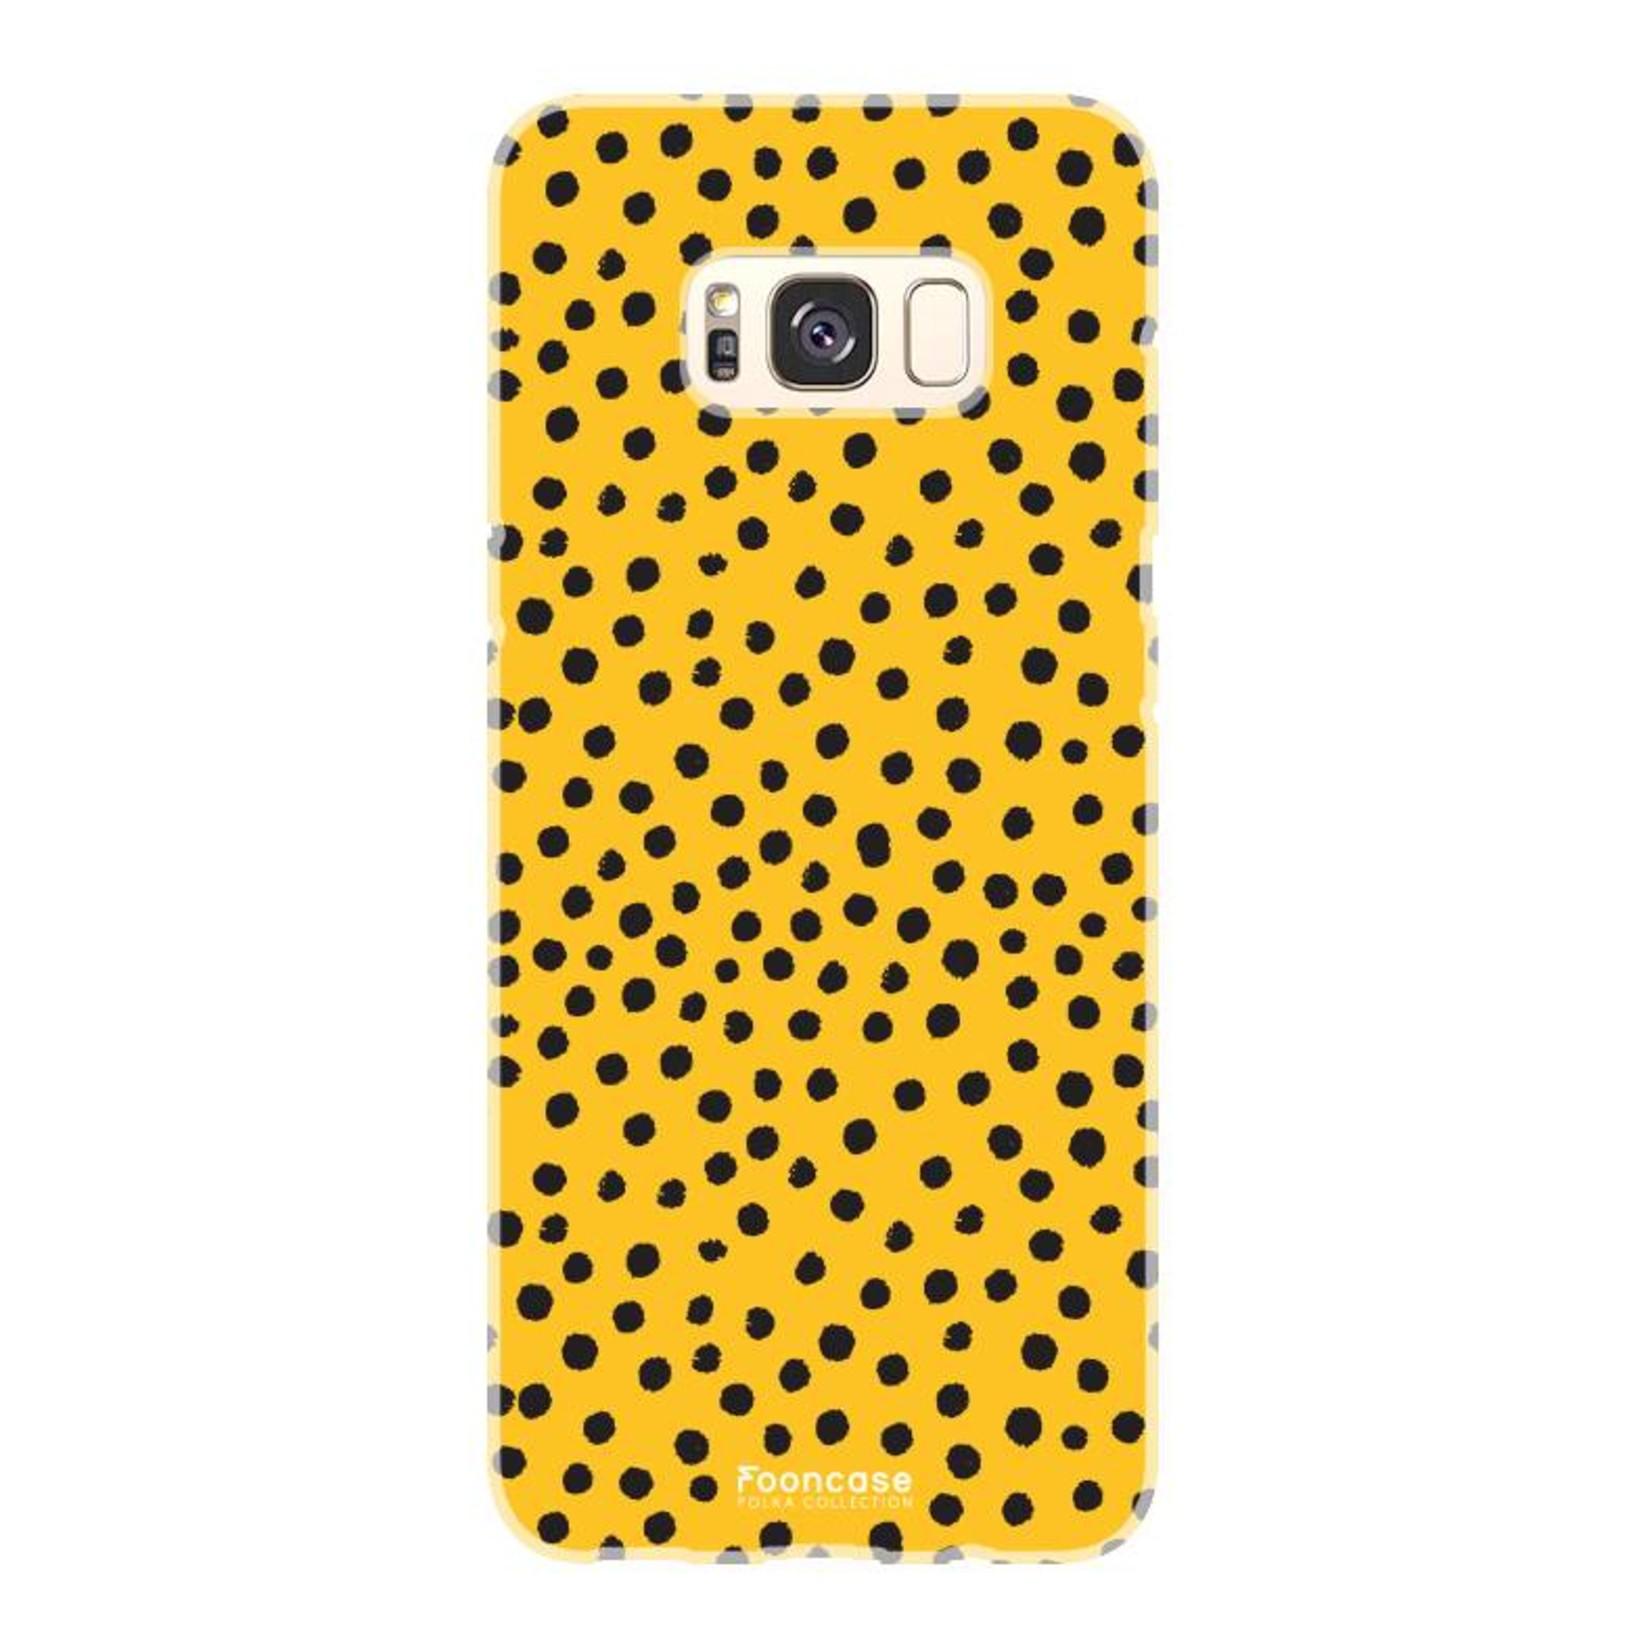 FOONCASE Samsung Galaxy S8 Plus hoesje TPU Soft Case - Back Cover - POLKA COLLECTION / Stipjes / Stippen / Oker Geel